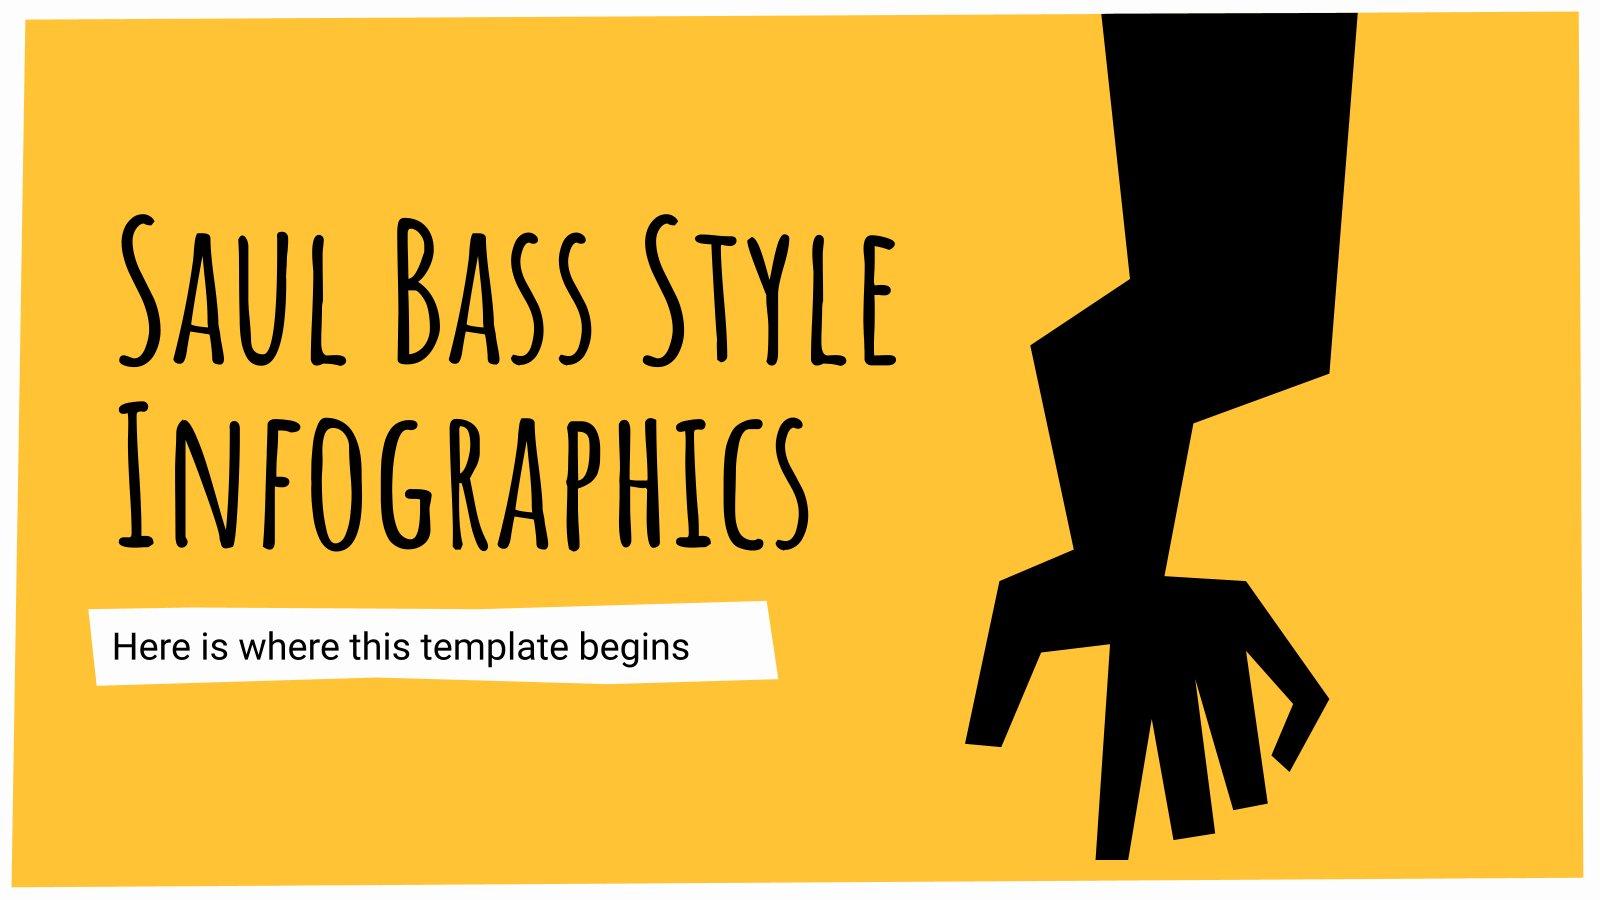 Saul Bass Style Infographics presentation template